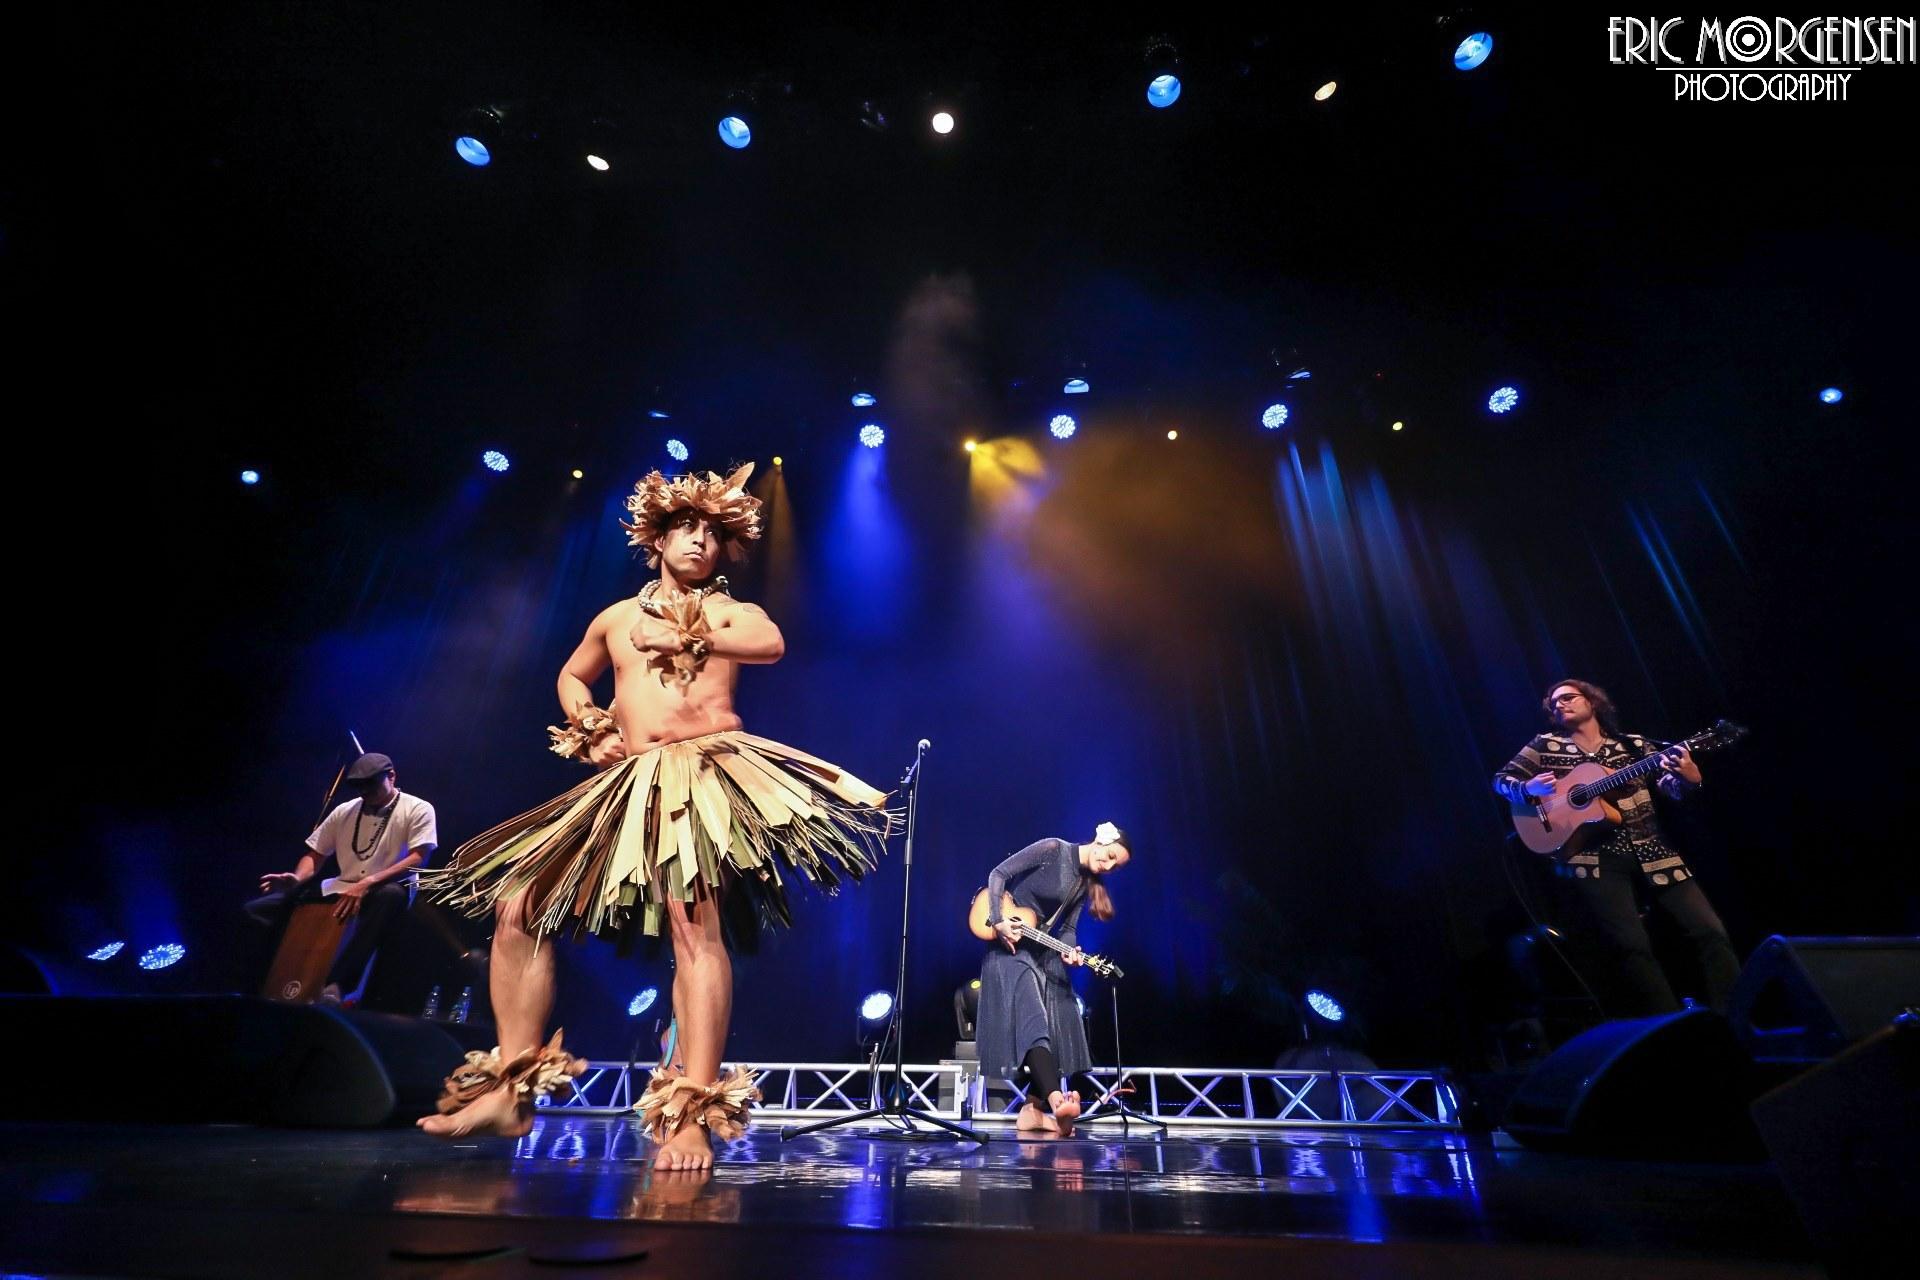 2019-05-16 - Admiral Theatre - Bremberton WA_21.jpg